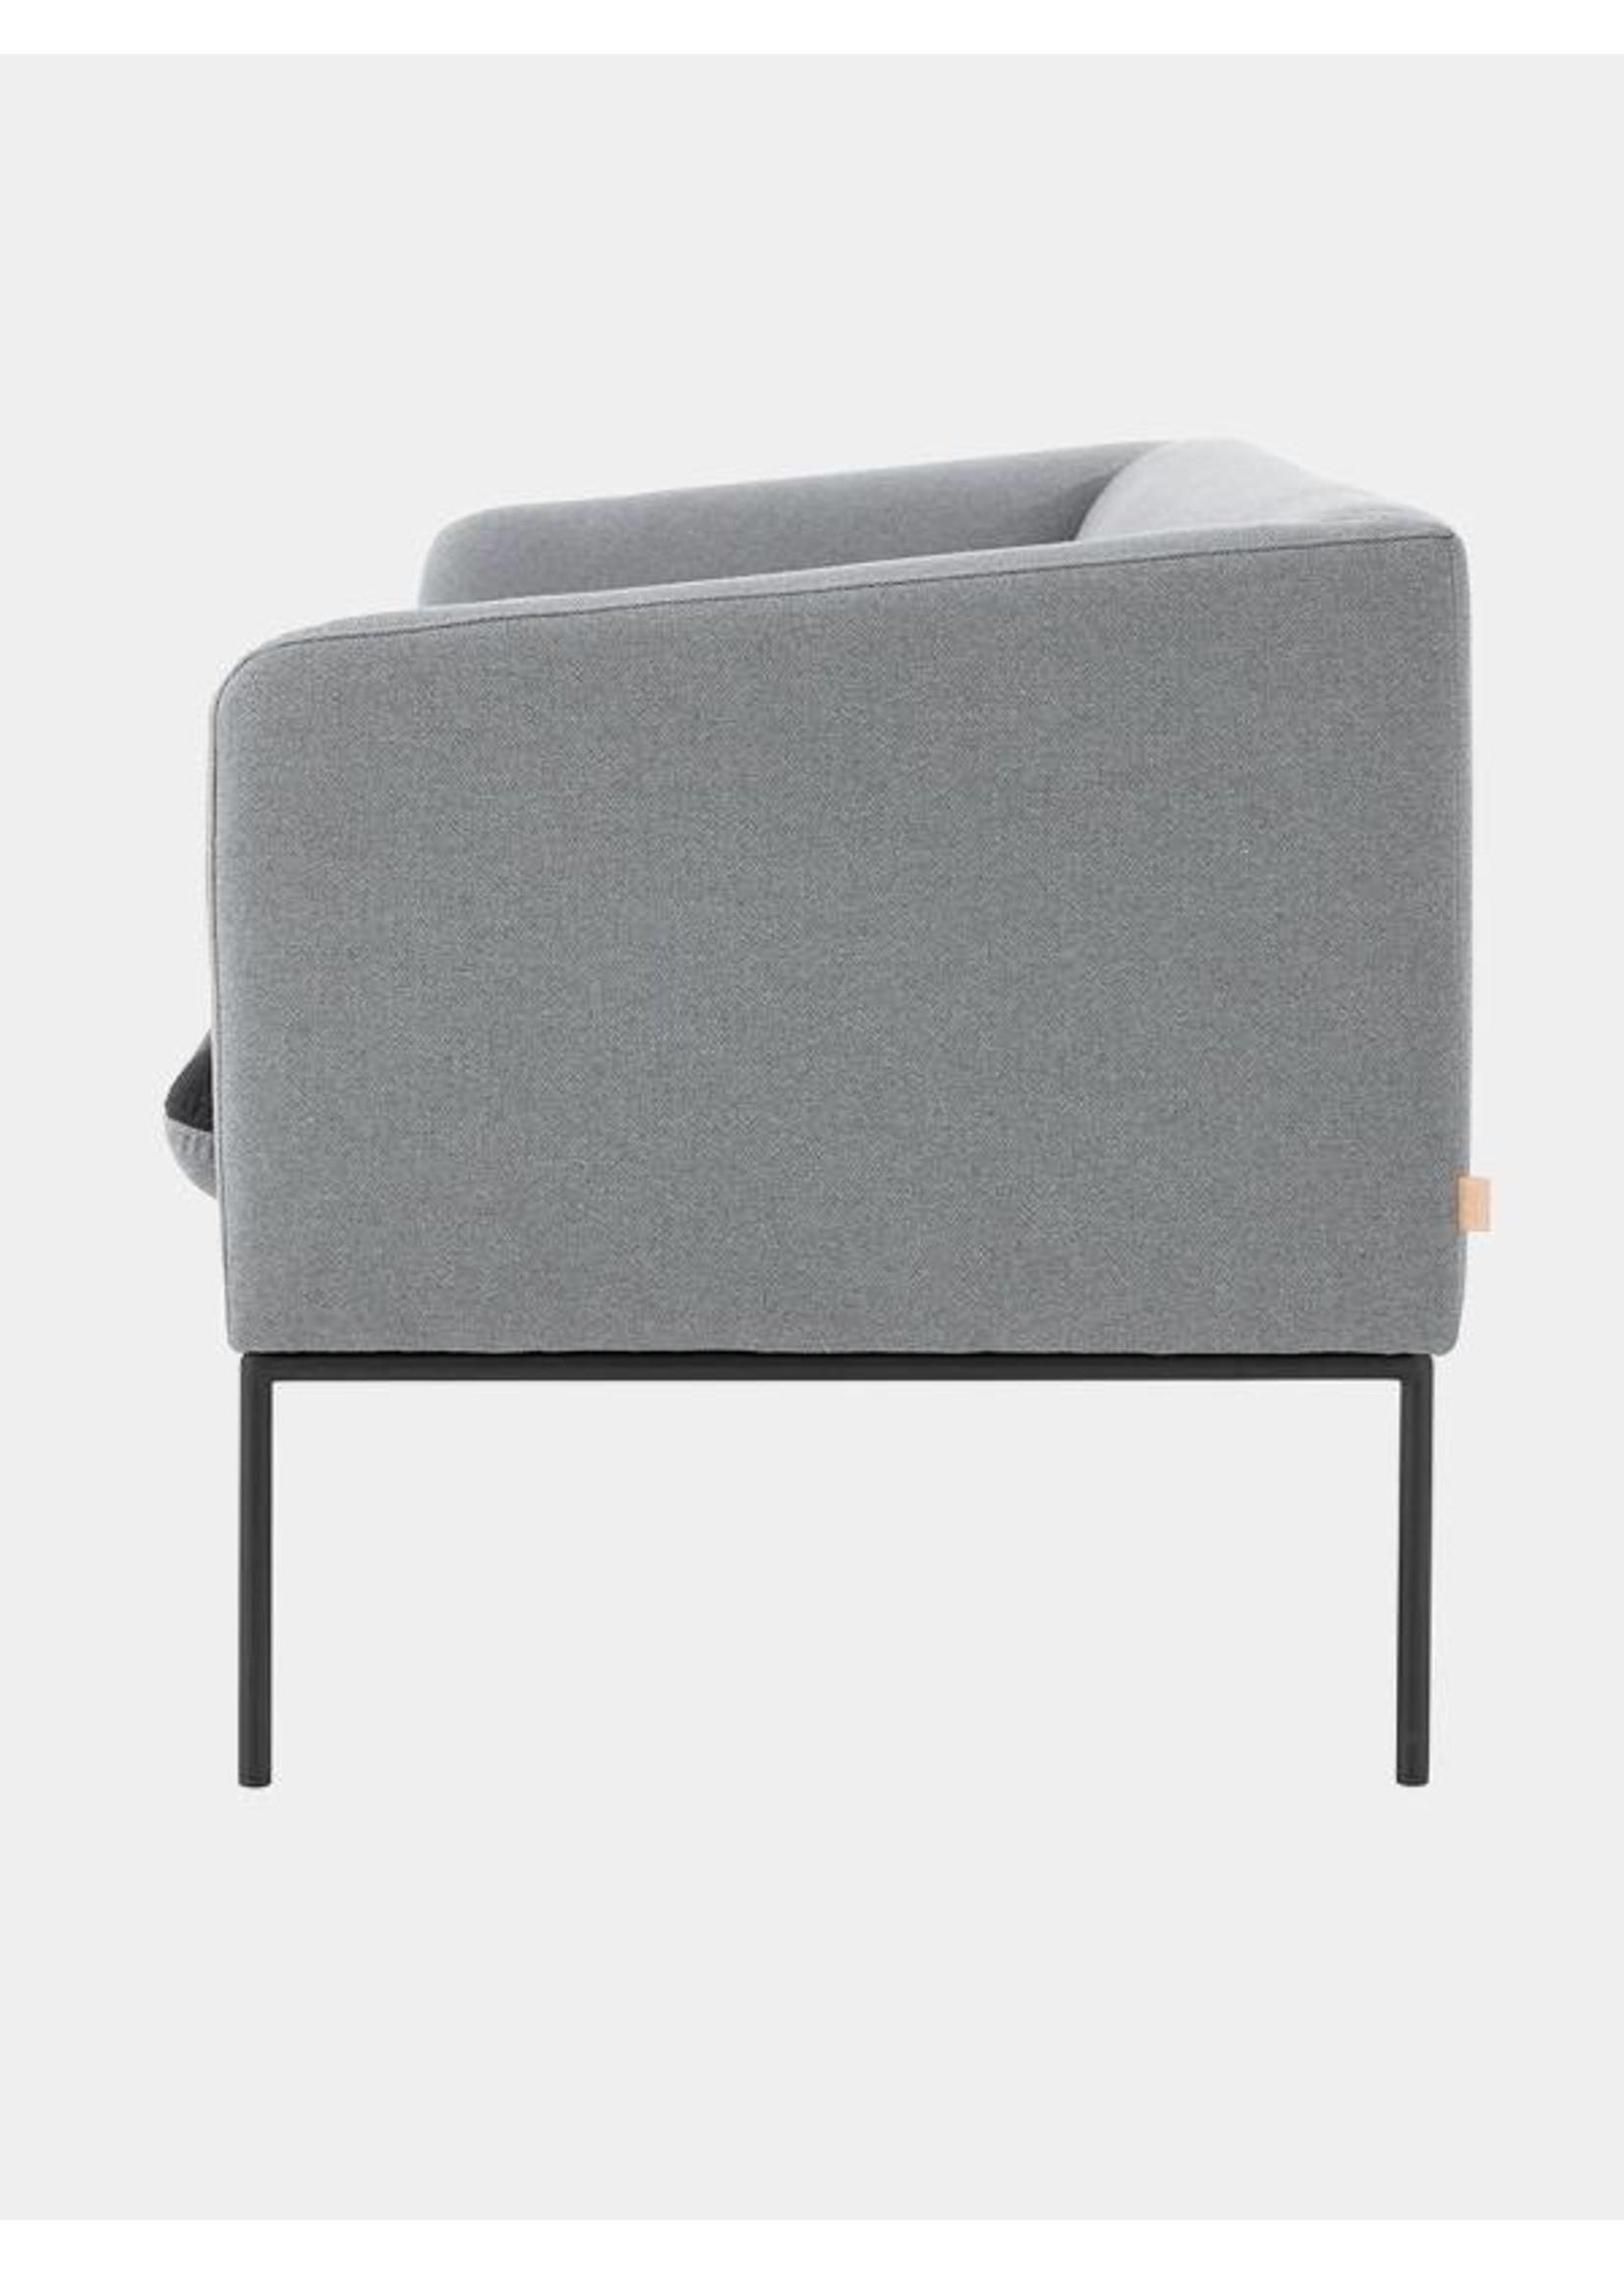 ferm LIVING ferm LIVING Turn Sofa - 2 Seater - Cotton